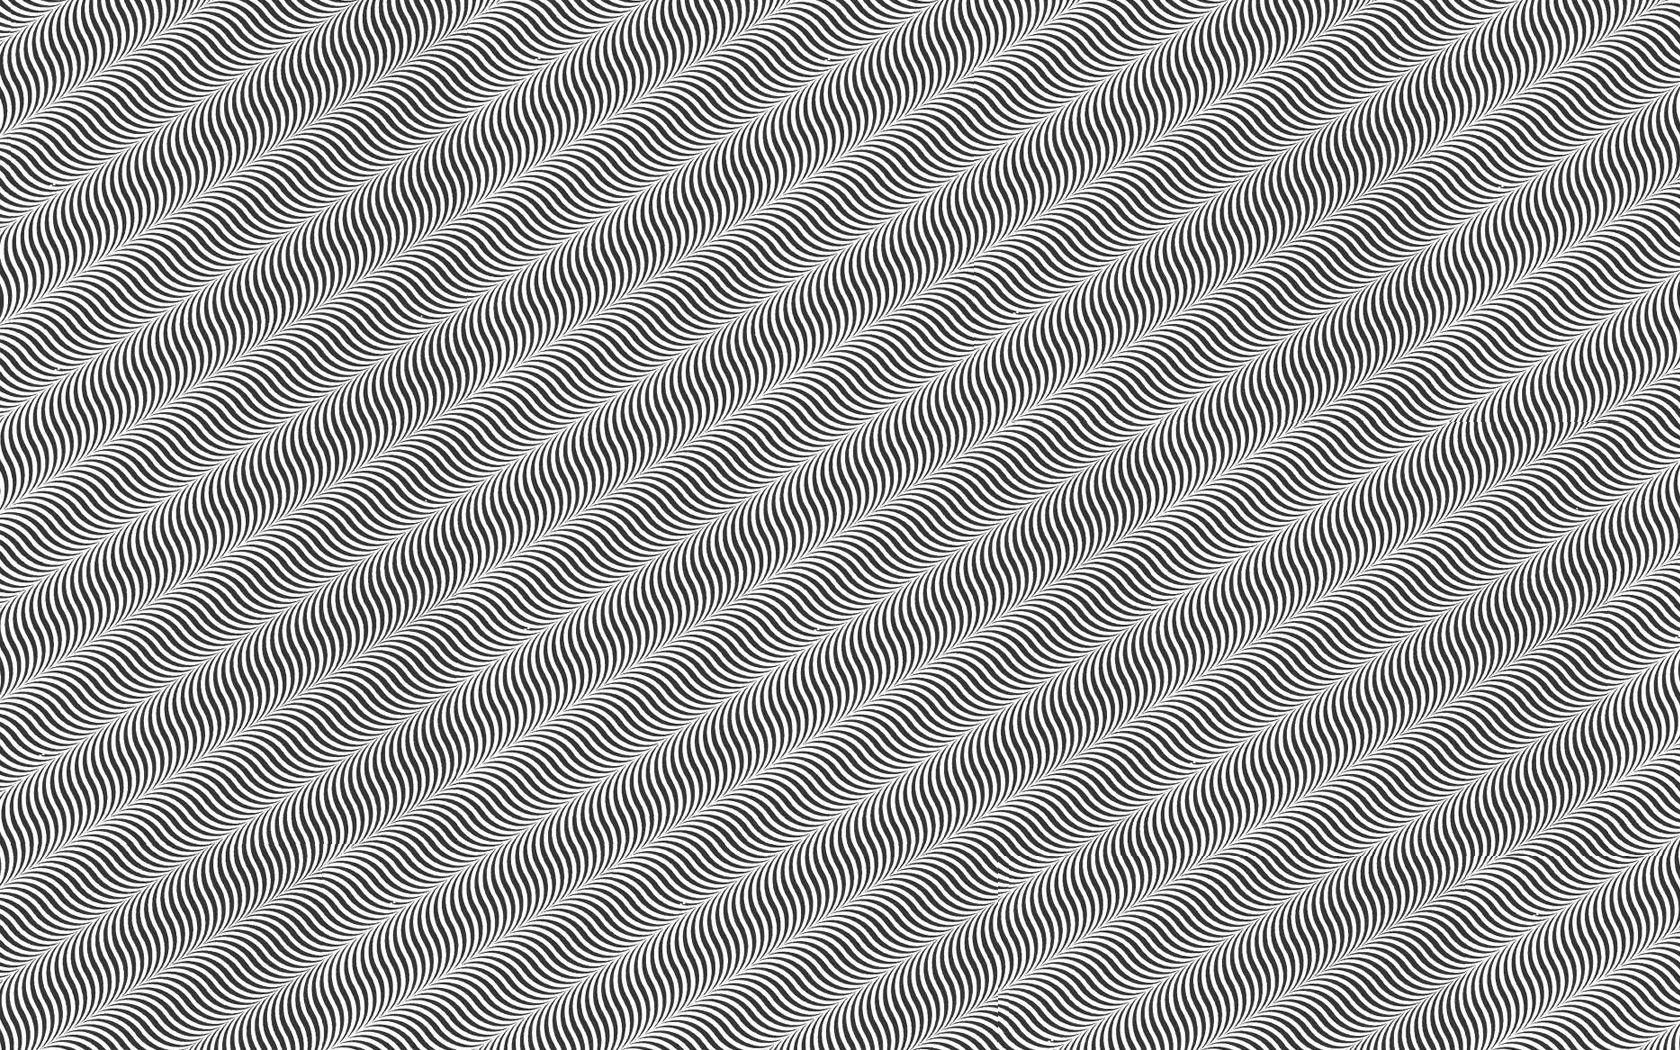 Photos illusion car moving optical illusion spectacular optical - Optical Illusion Wallpapers Wallpaper